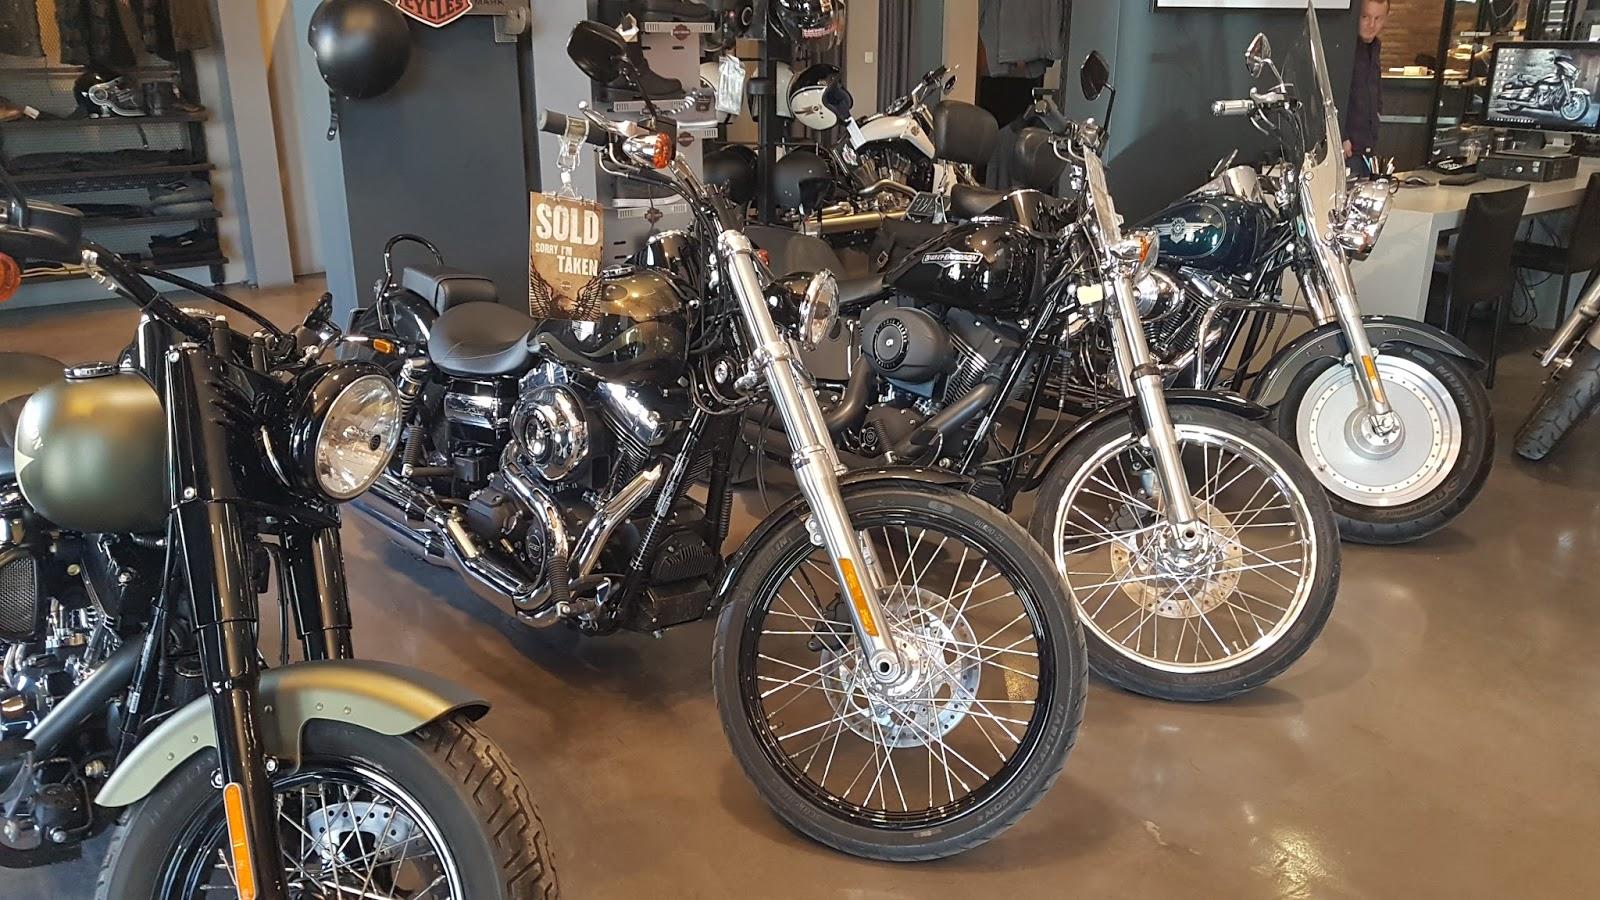 HAD1 Γιατί η Ρόδος γέμισε Harley Davidson; Harley-Davidson